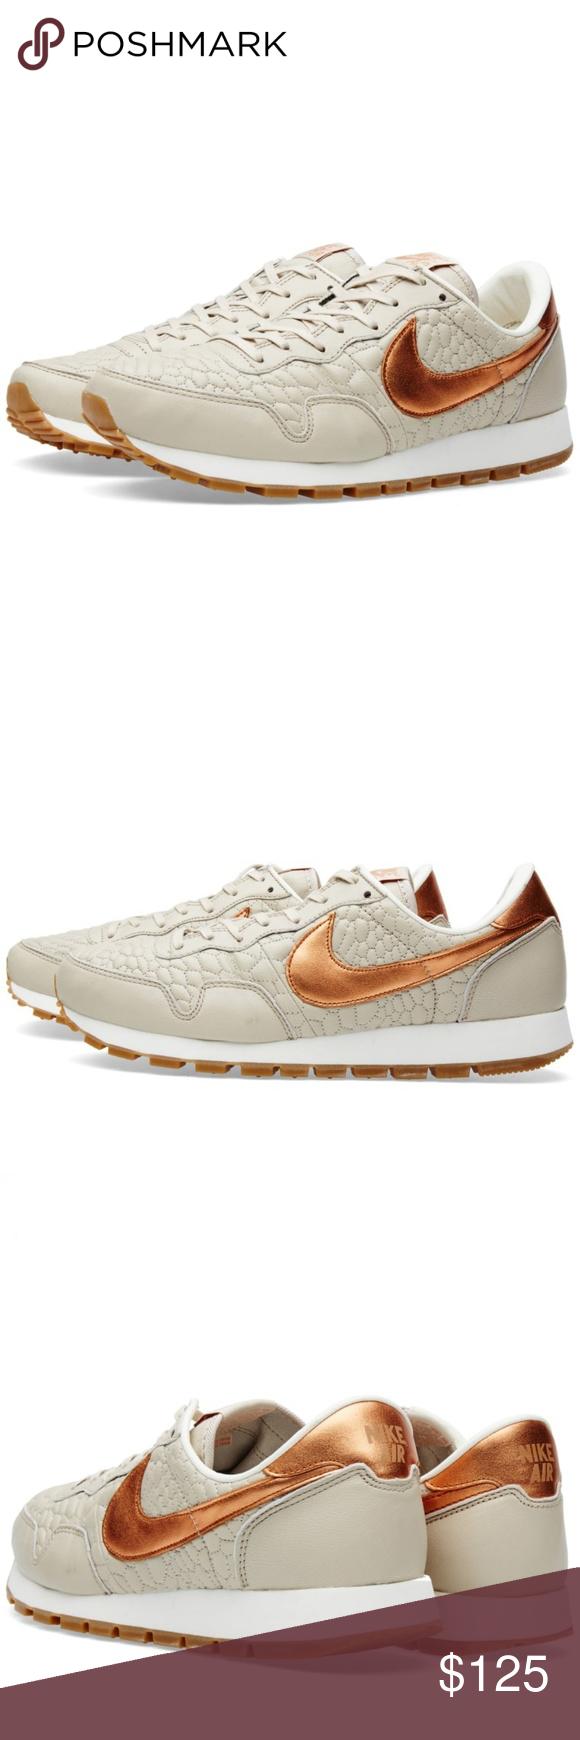 Nike Air Pegasus 83 Premium Quilted Women's Shoe.